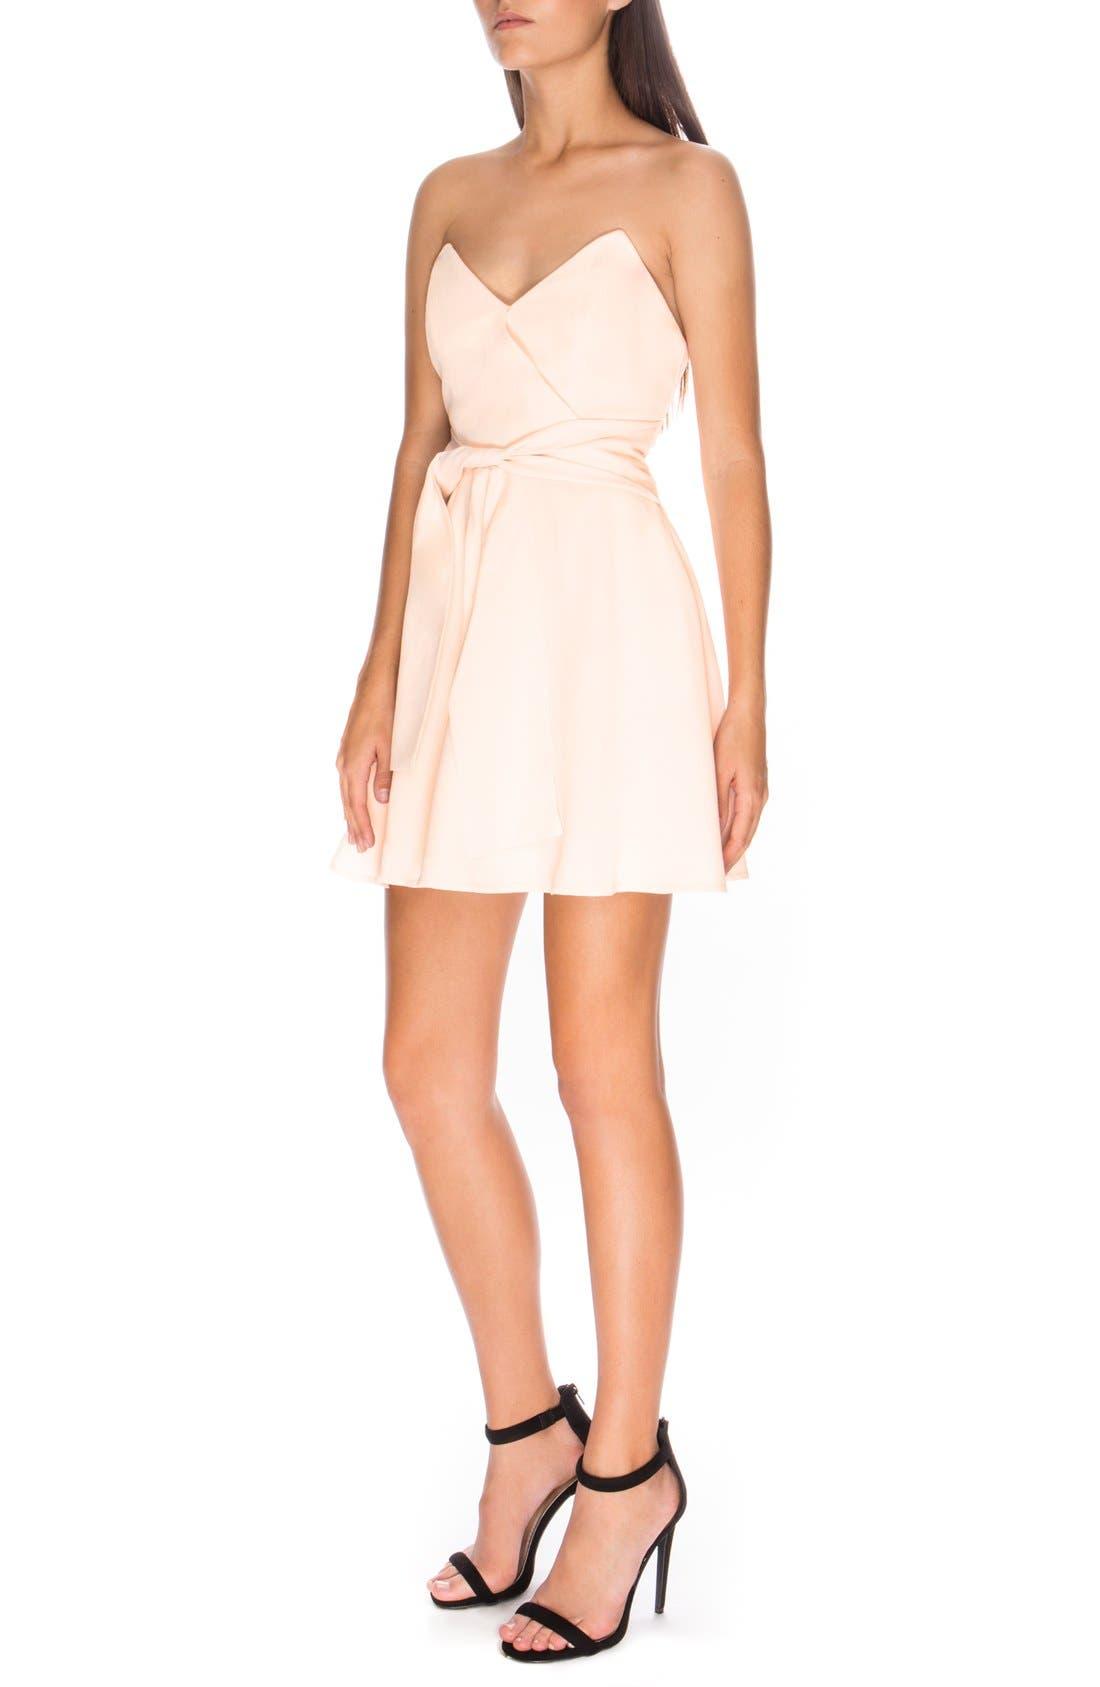 Alternate Image 3  - Keepsake the Label 'Get Free' Strapless Minidress